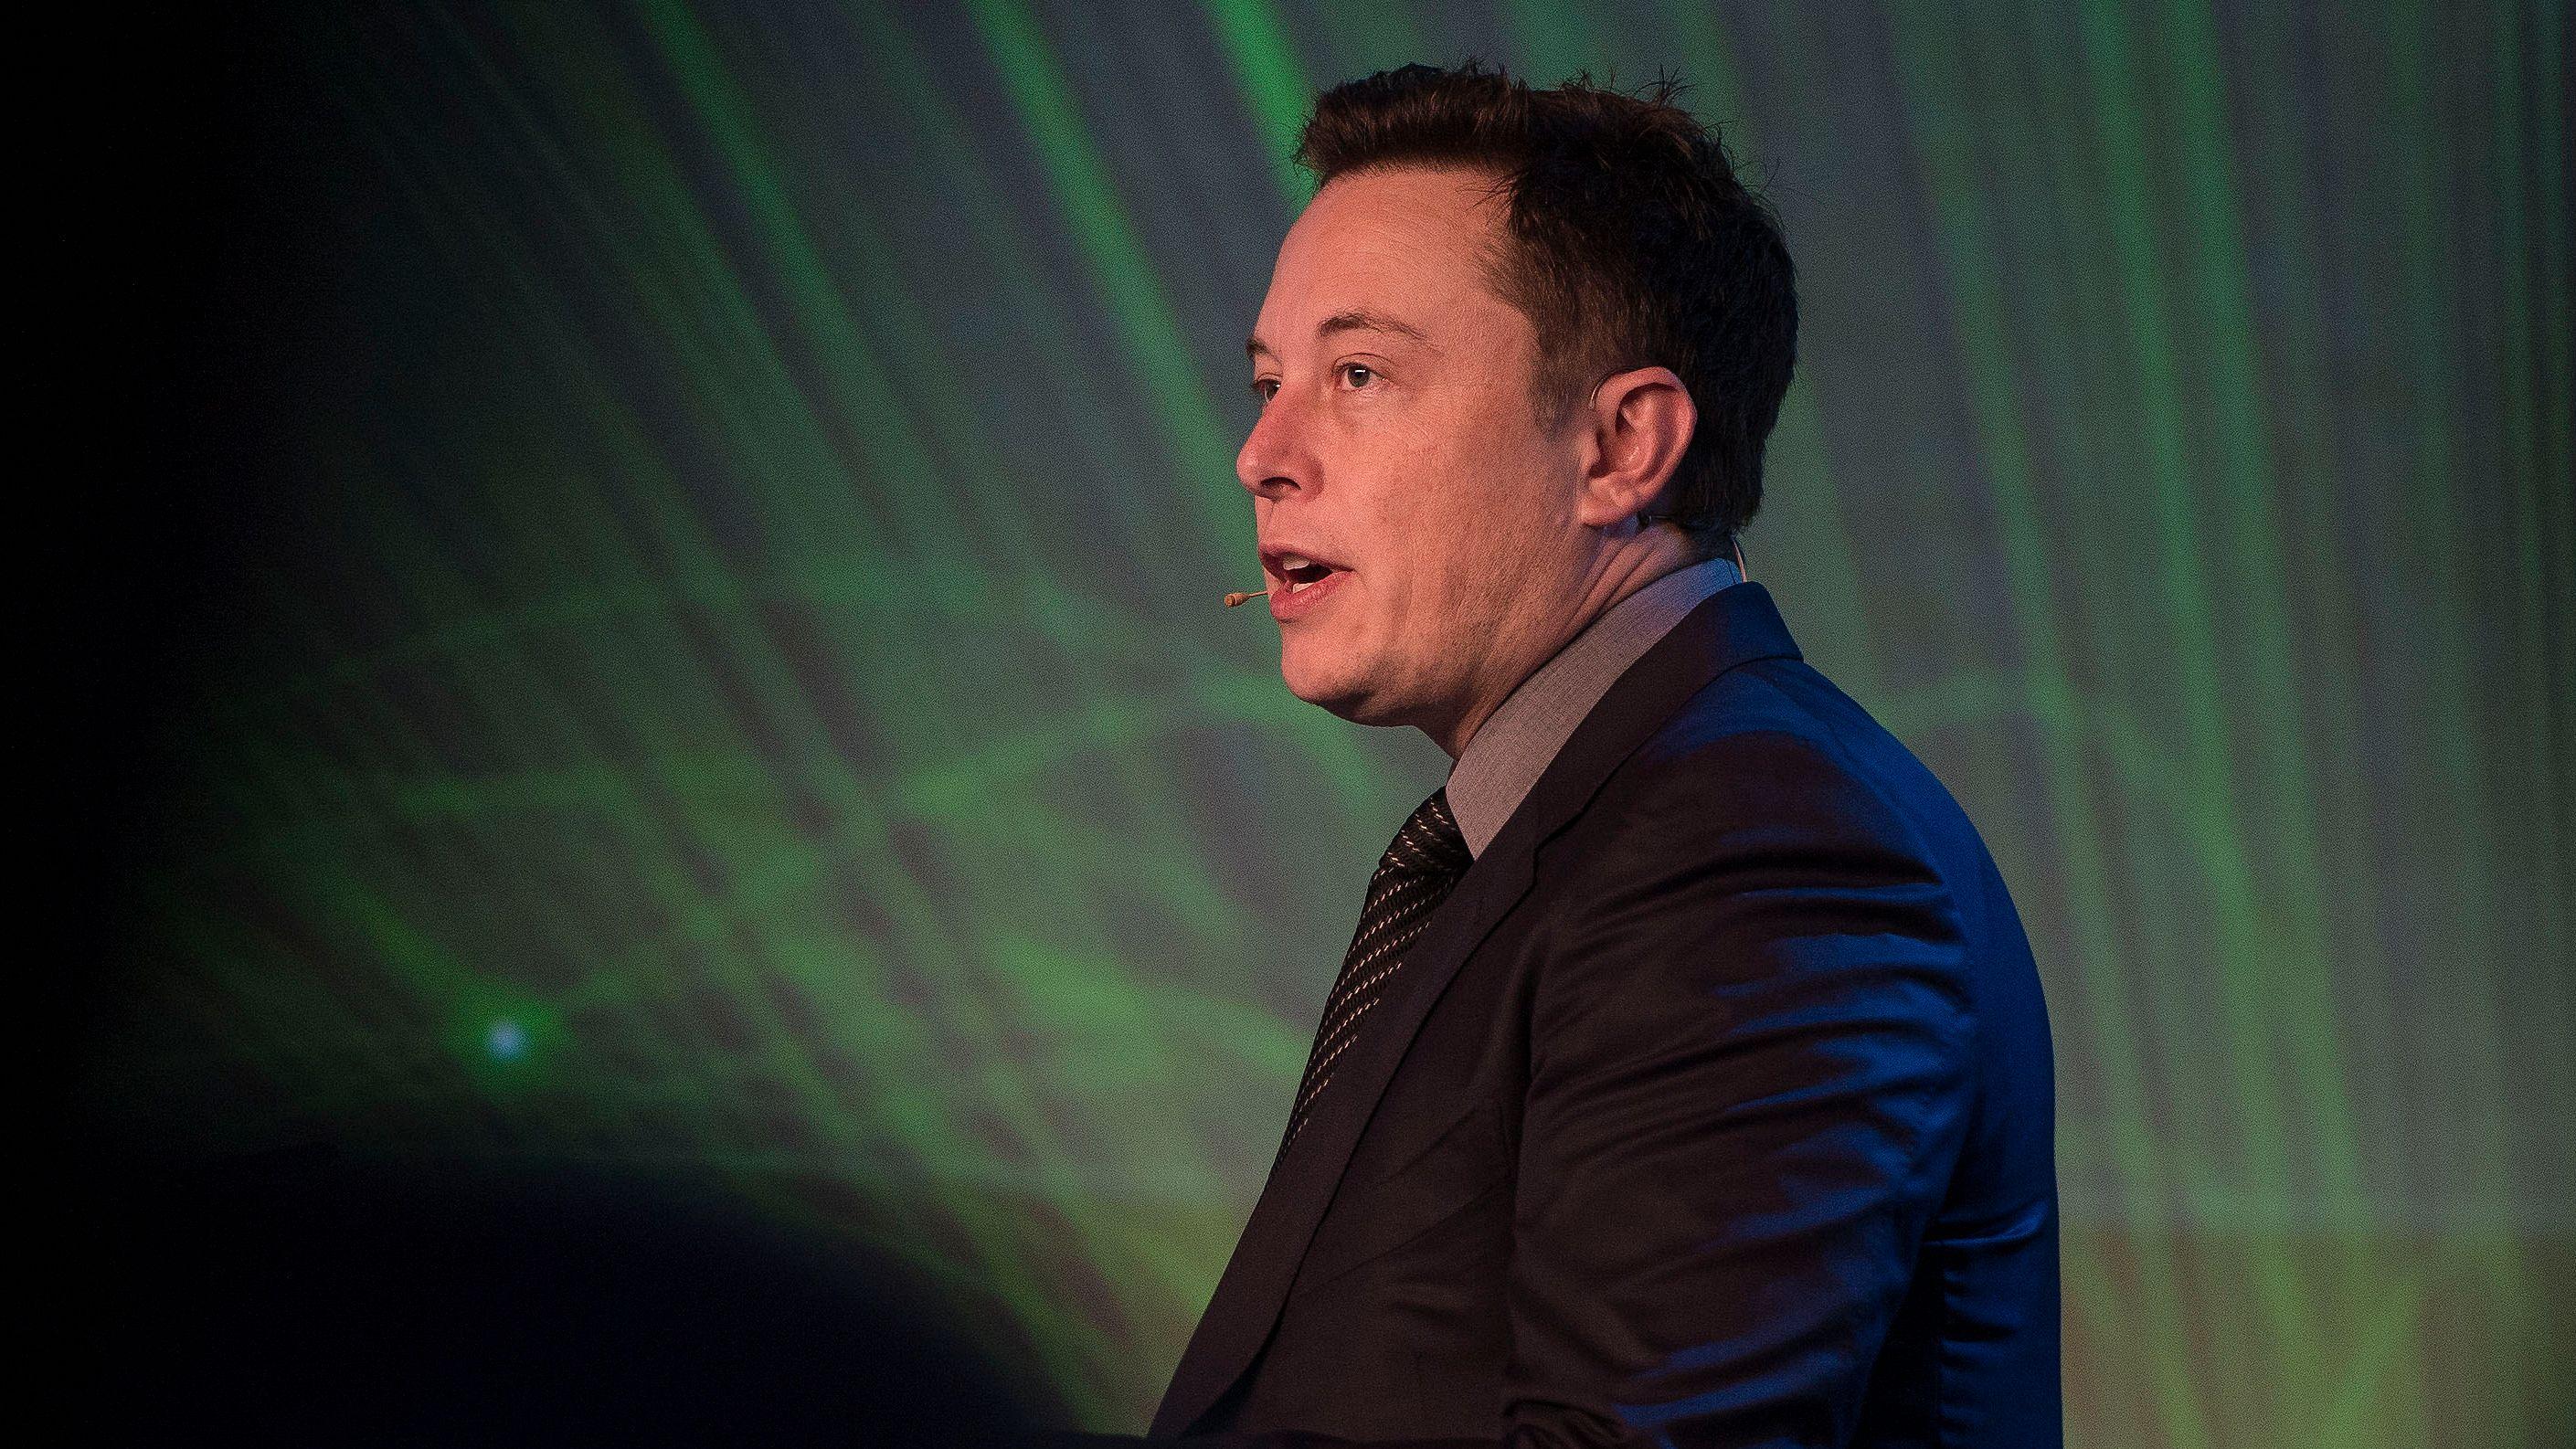 Elon Musk i Tesla.Foto: Carina Johansen / NTB Scanpix